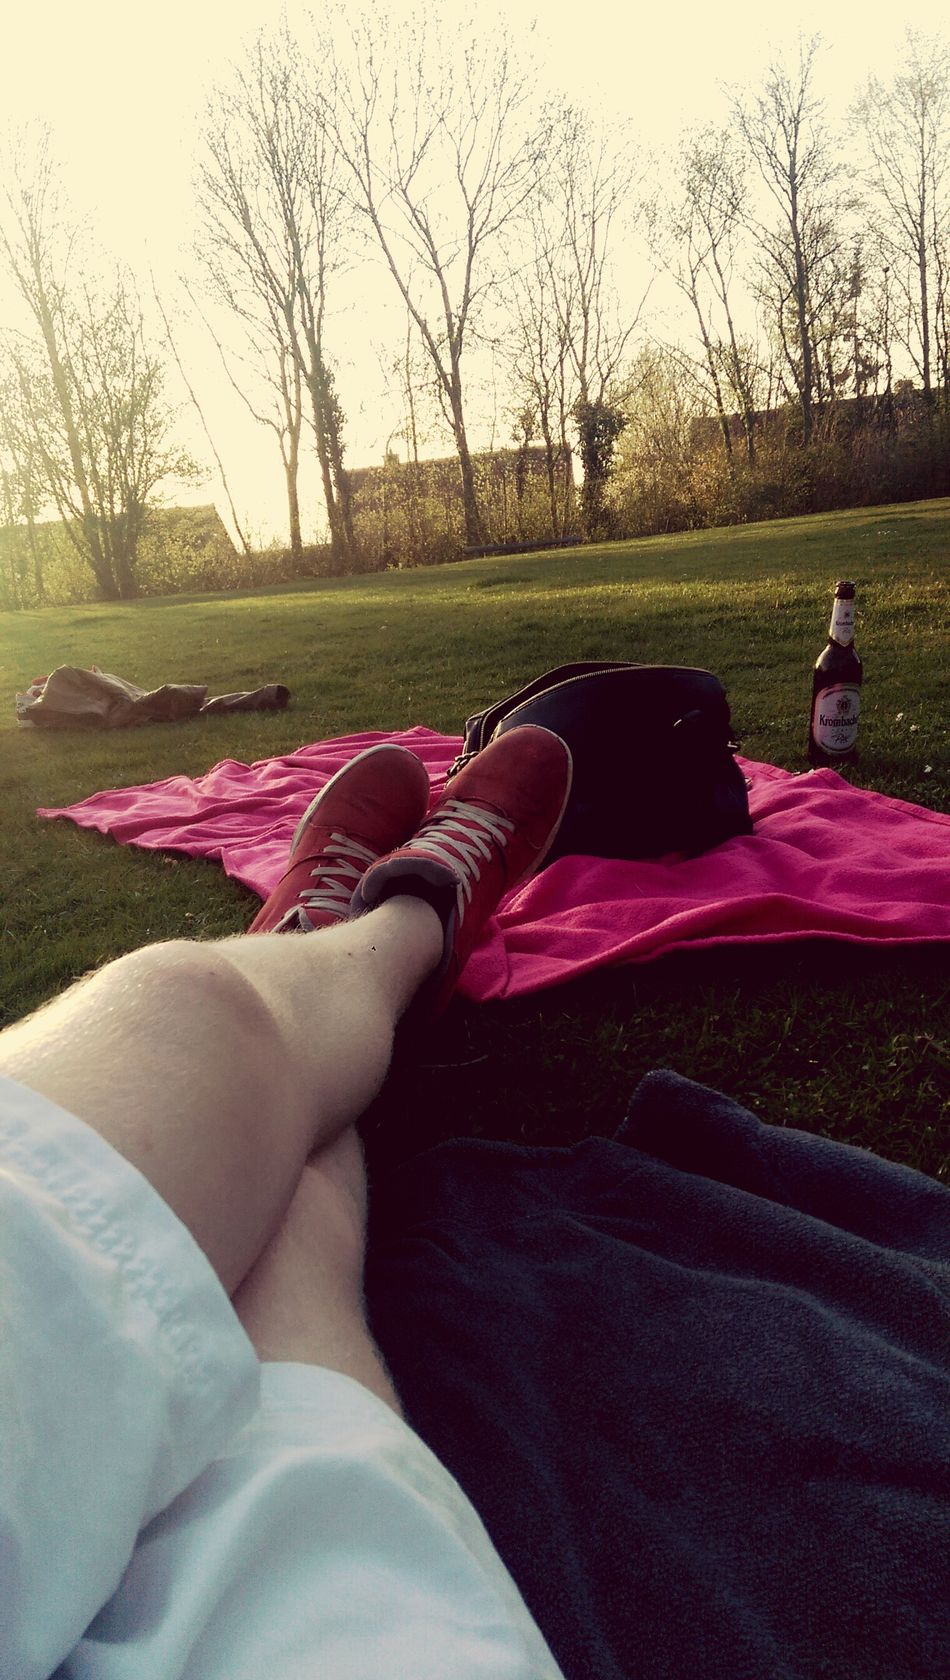 Grillen chilln Kasten killen 😍 Nice Weather Nice Das Relax Music UE BOOM Bert Time